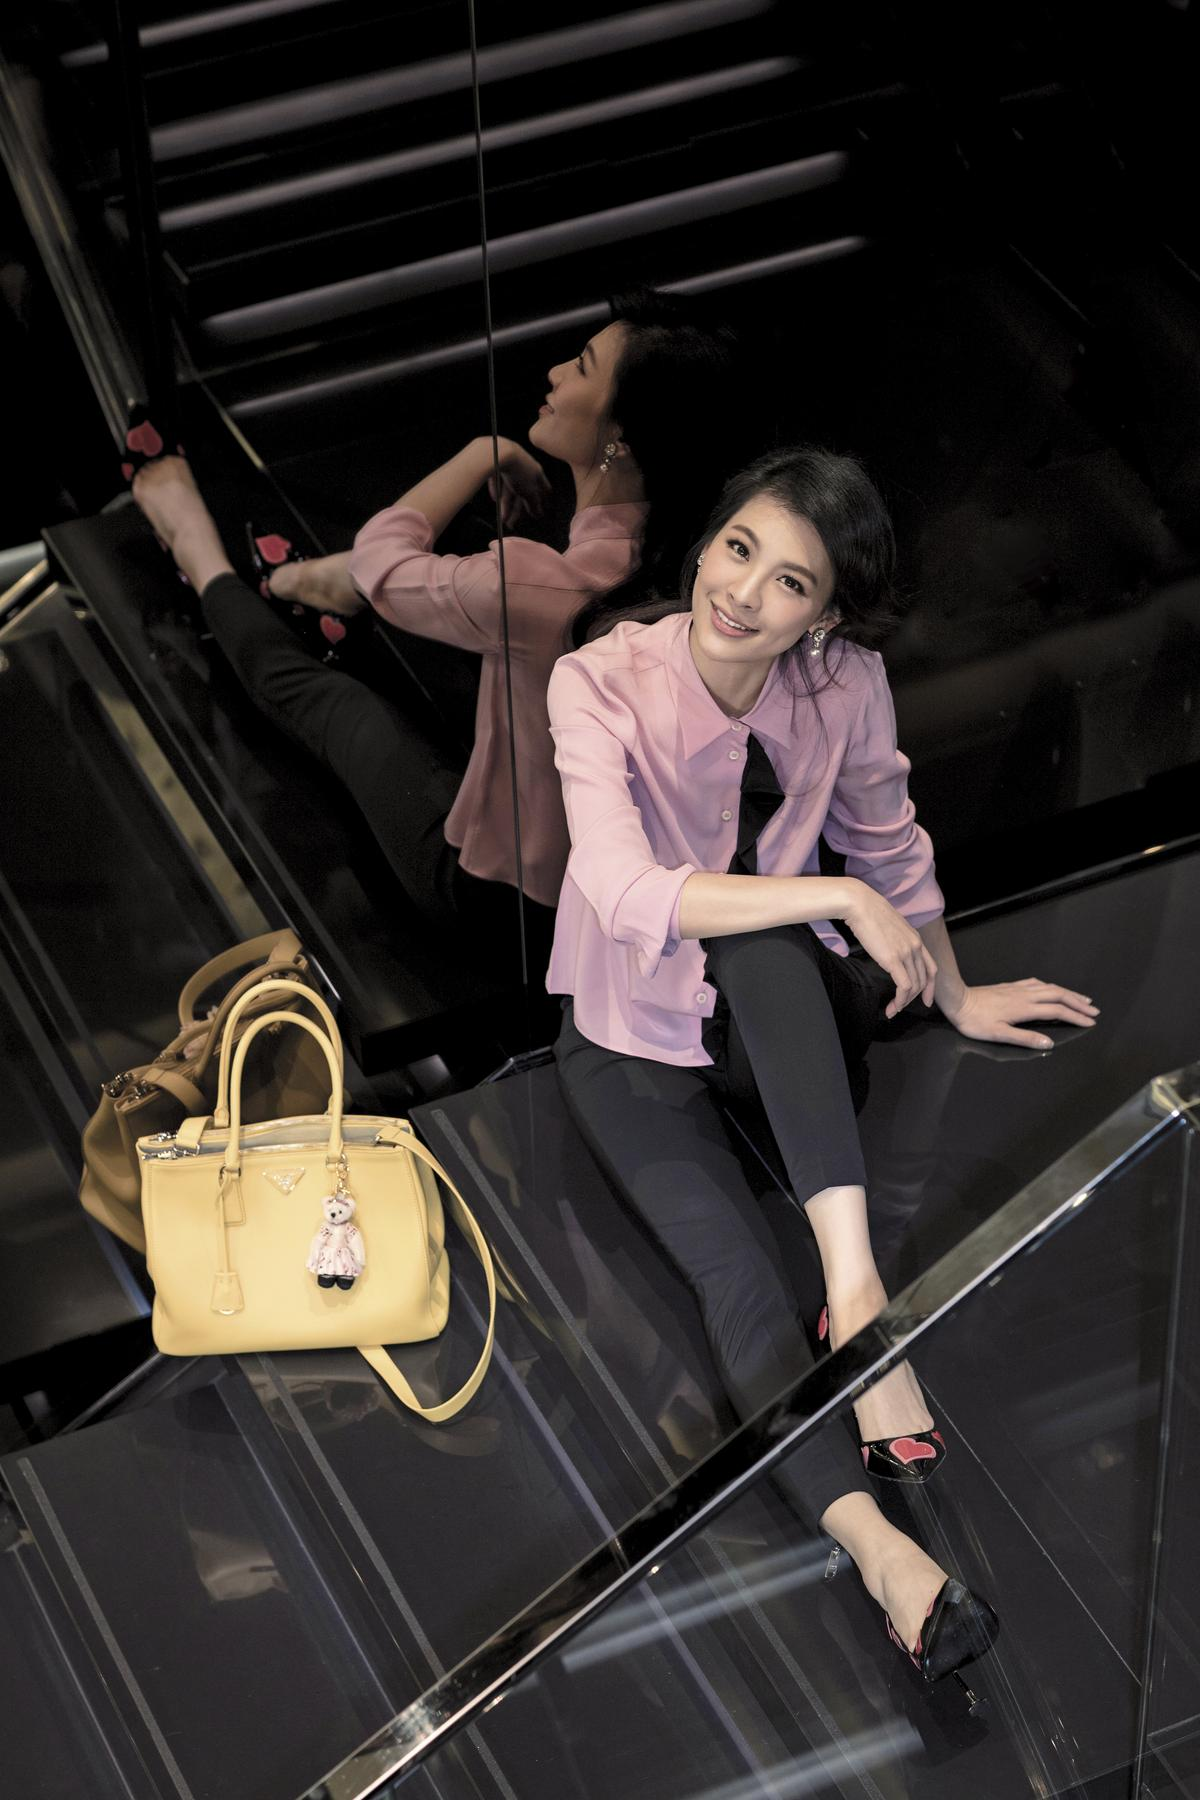 粉色絲質襯衫,NT$27,000。黑色西裝褲,NT$20,000。Safano黃色手提包,NT$74,000。小熊吊飾,NT$10,000。愛心圖騰高跟鞋,NT$35,500(All by PRADA)